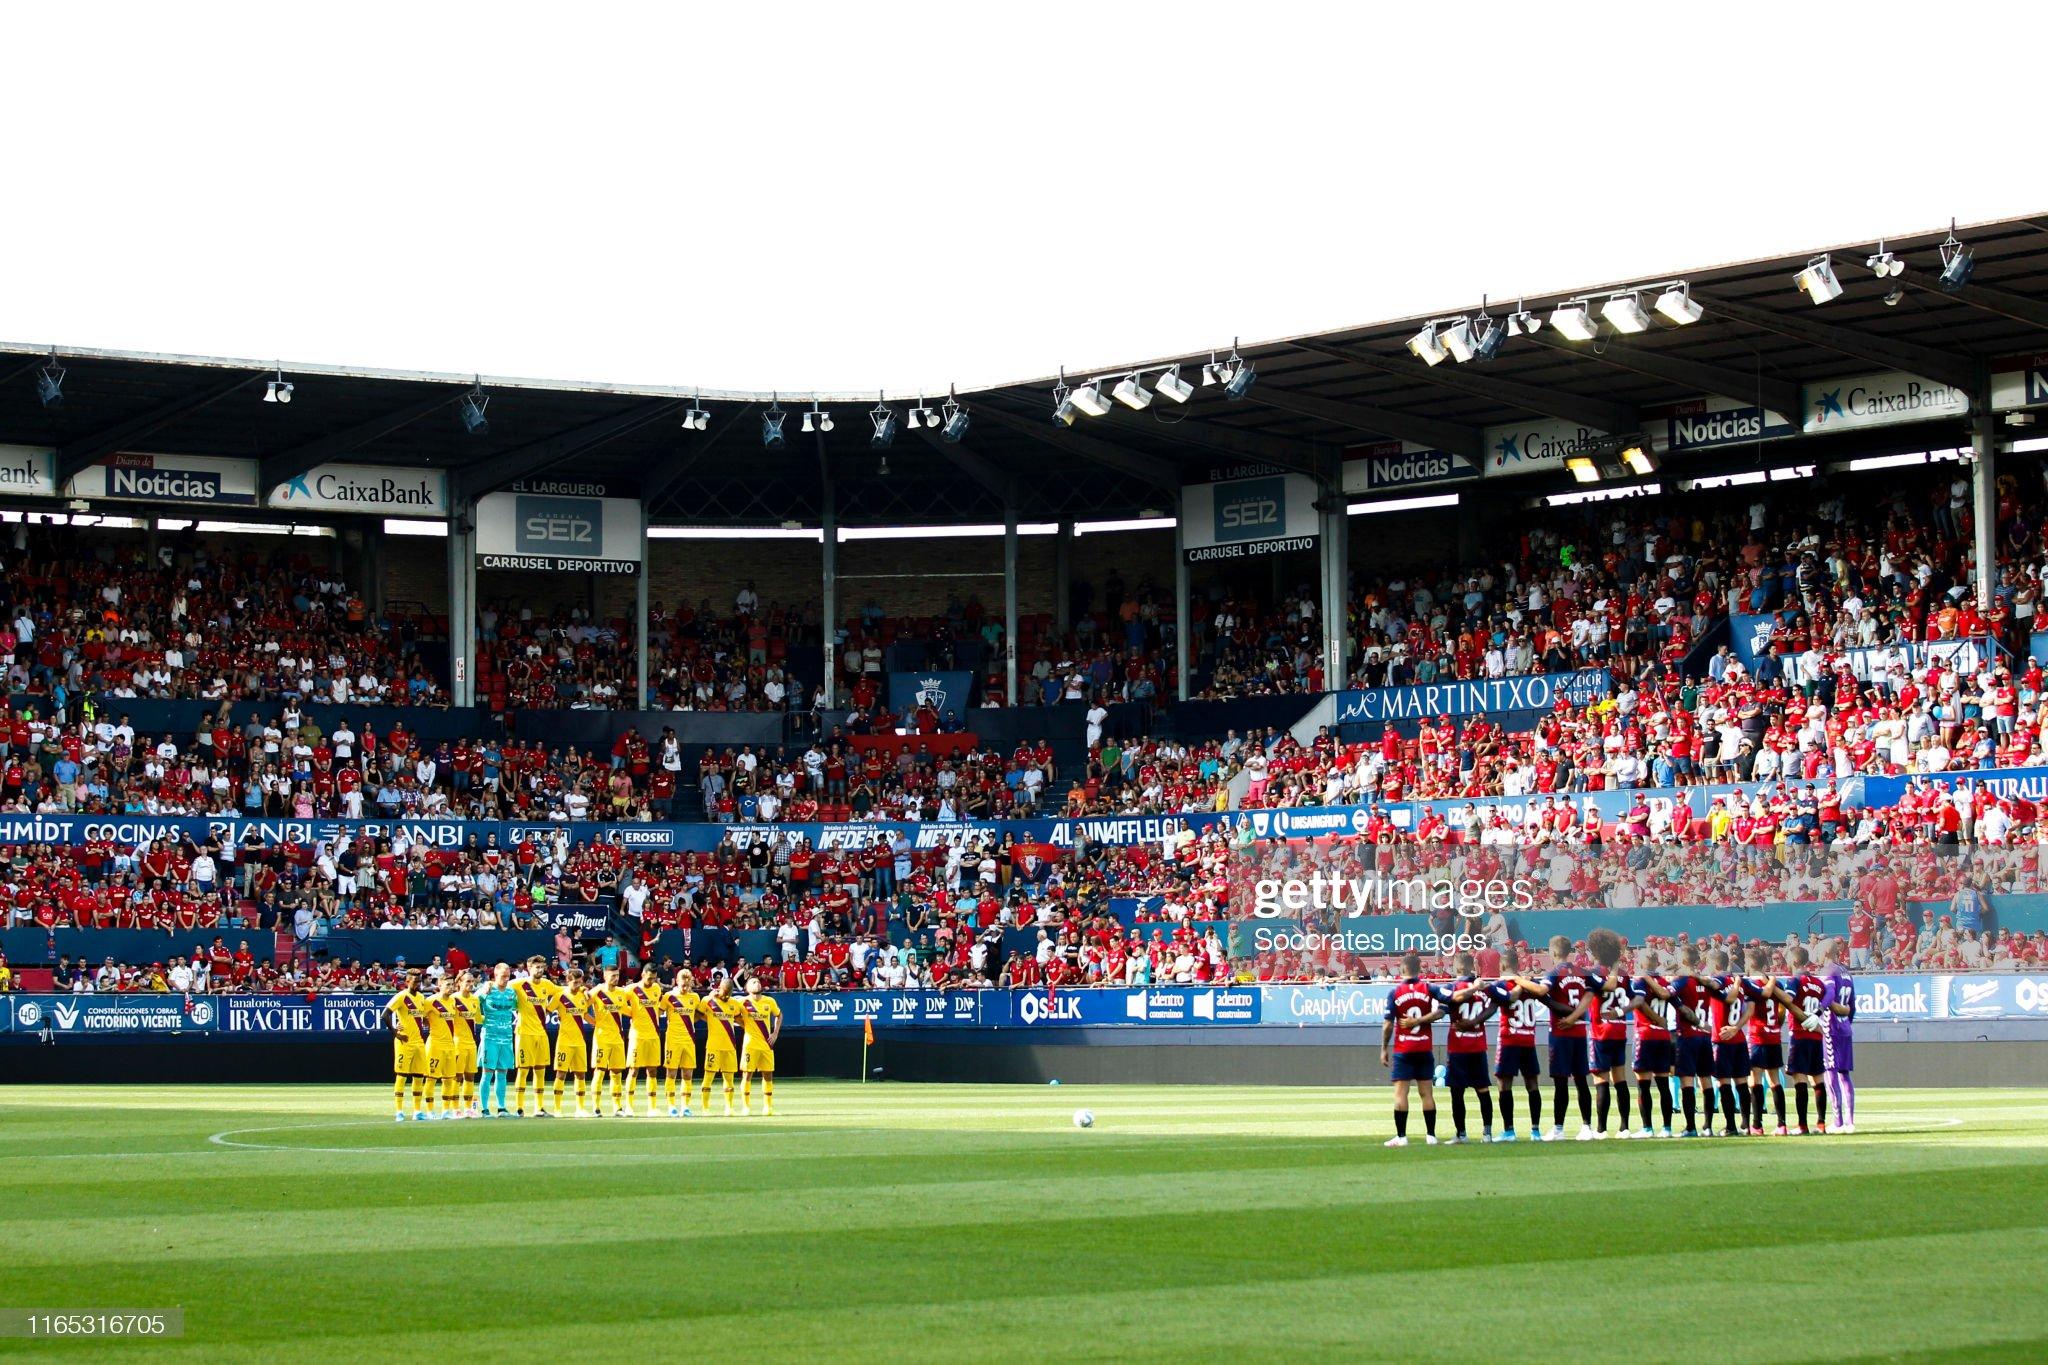 صور مباراة : أوساسونا - برشلونة 2-2 ( 31-08-2019 )  Teamphoto-of-fc-barcelona-marc-andre-ter-stegen-of-fc-barcelona-of-picture-id1165316705?s=2048x2048